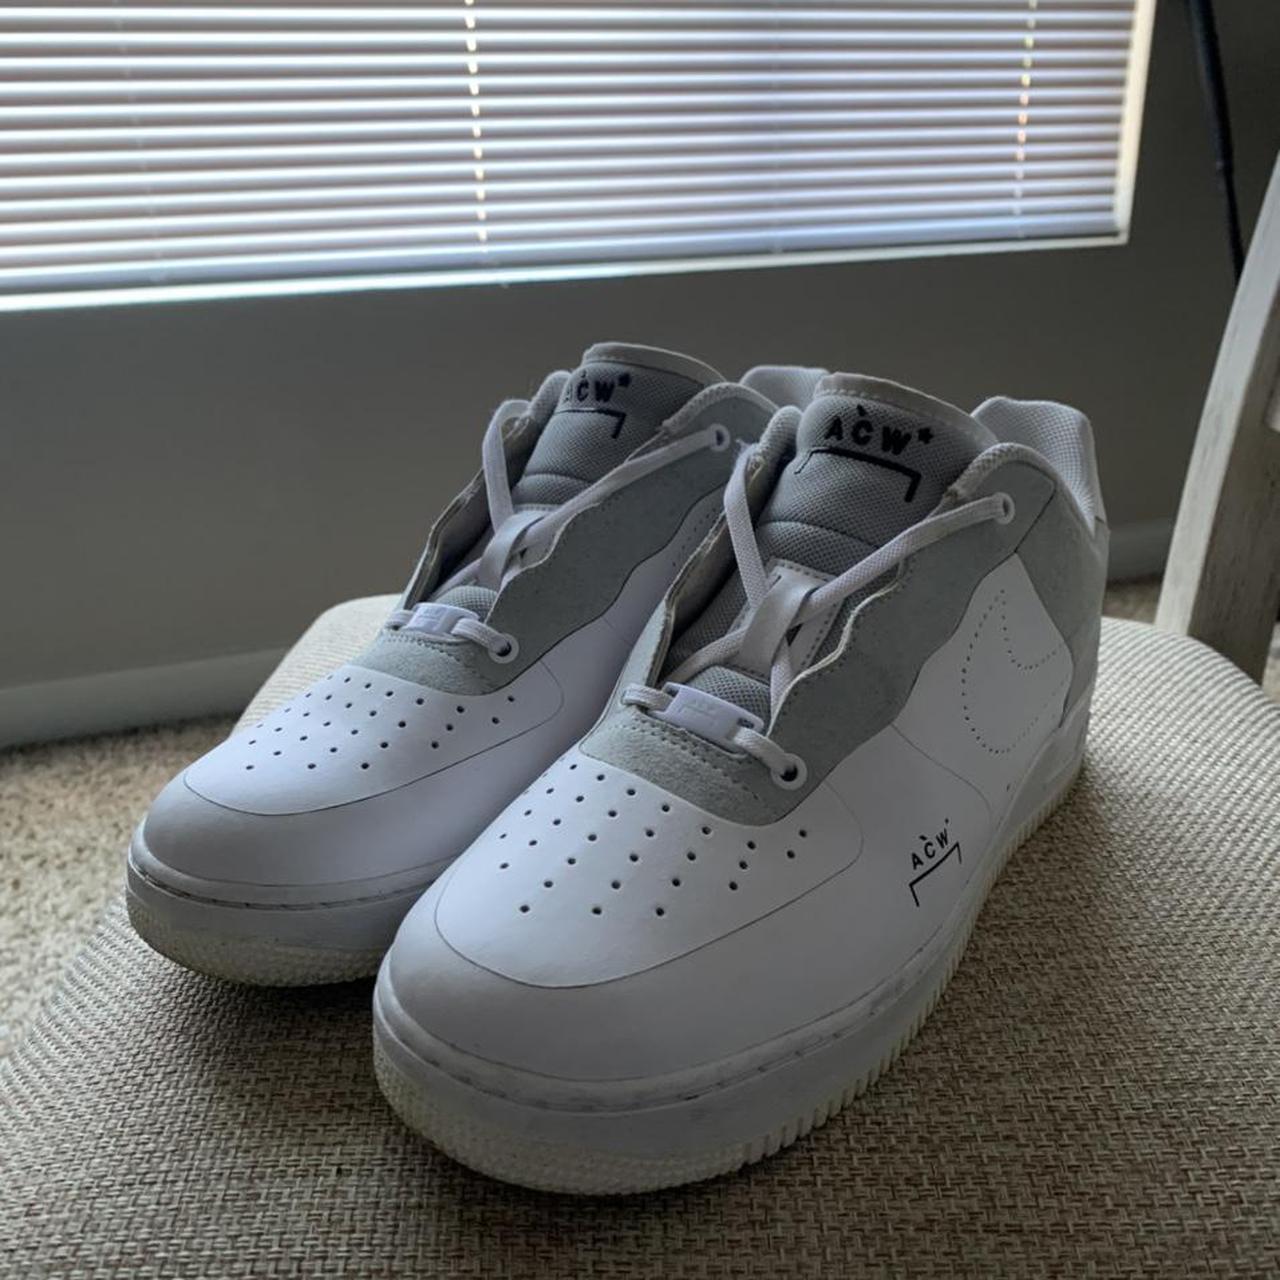 Product Image 1 - No box Like new condition No heel